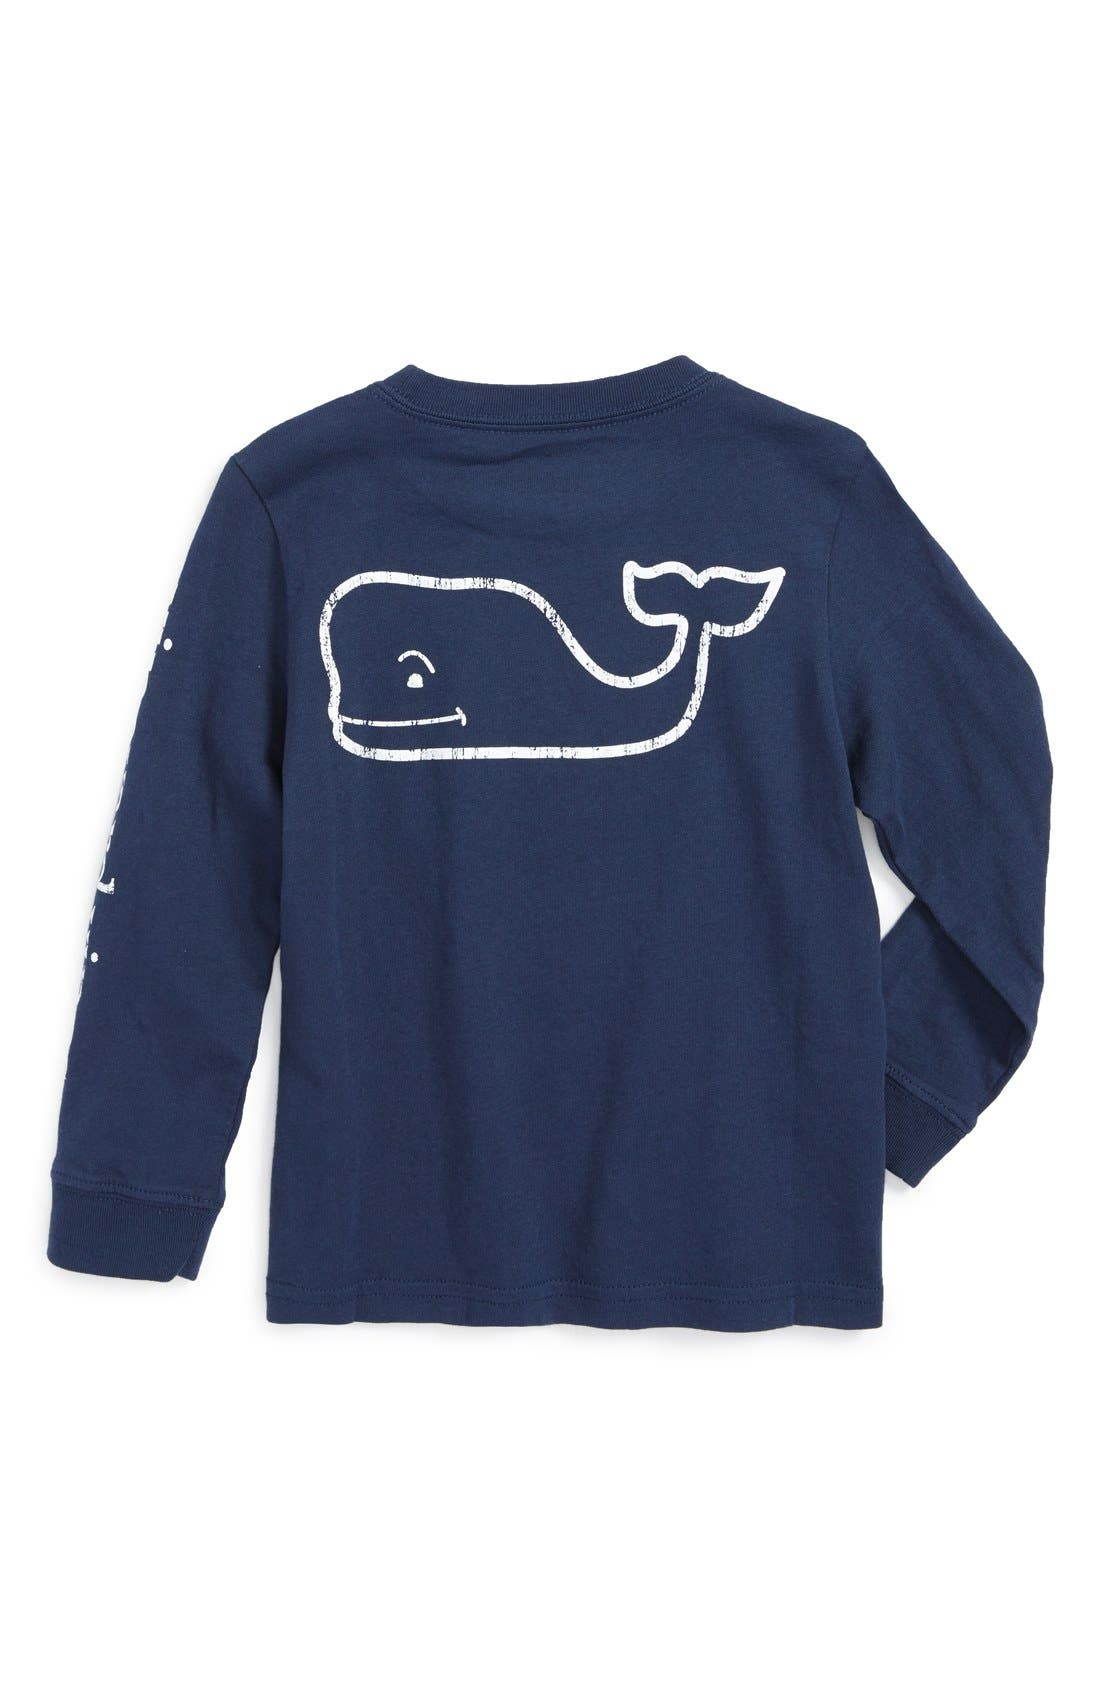 Alternate Image 2  - vineyard vines Vintage Whale Graphic Long Sleeve T-Shirt (Toddler Boys & Little Boys)